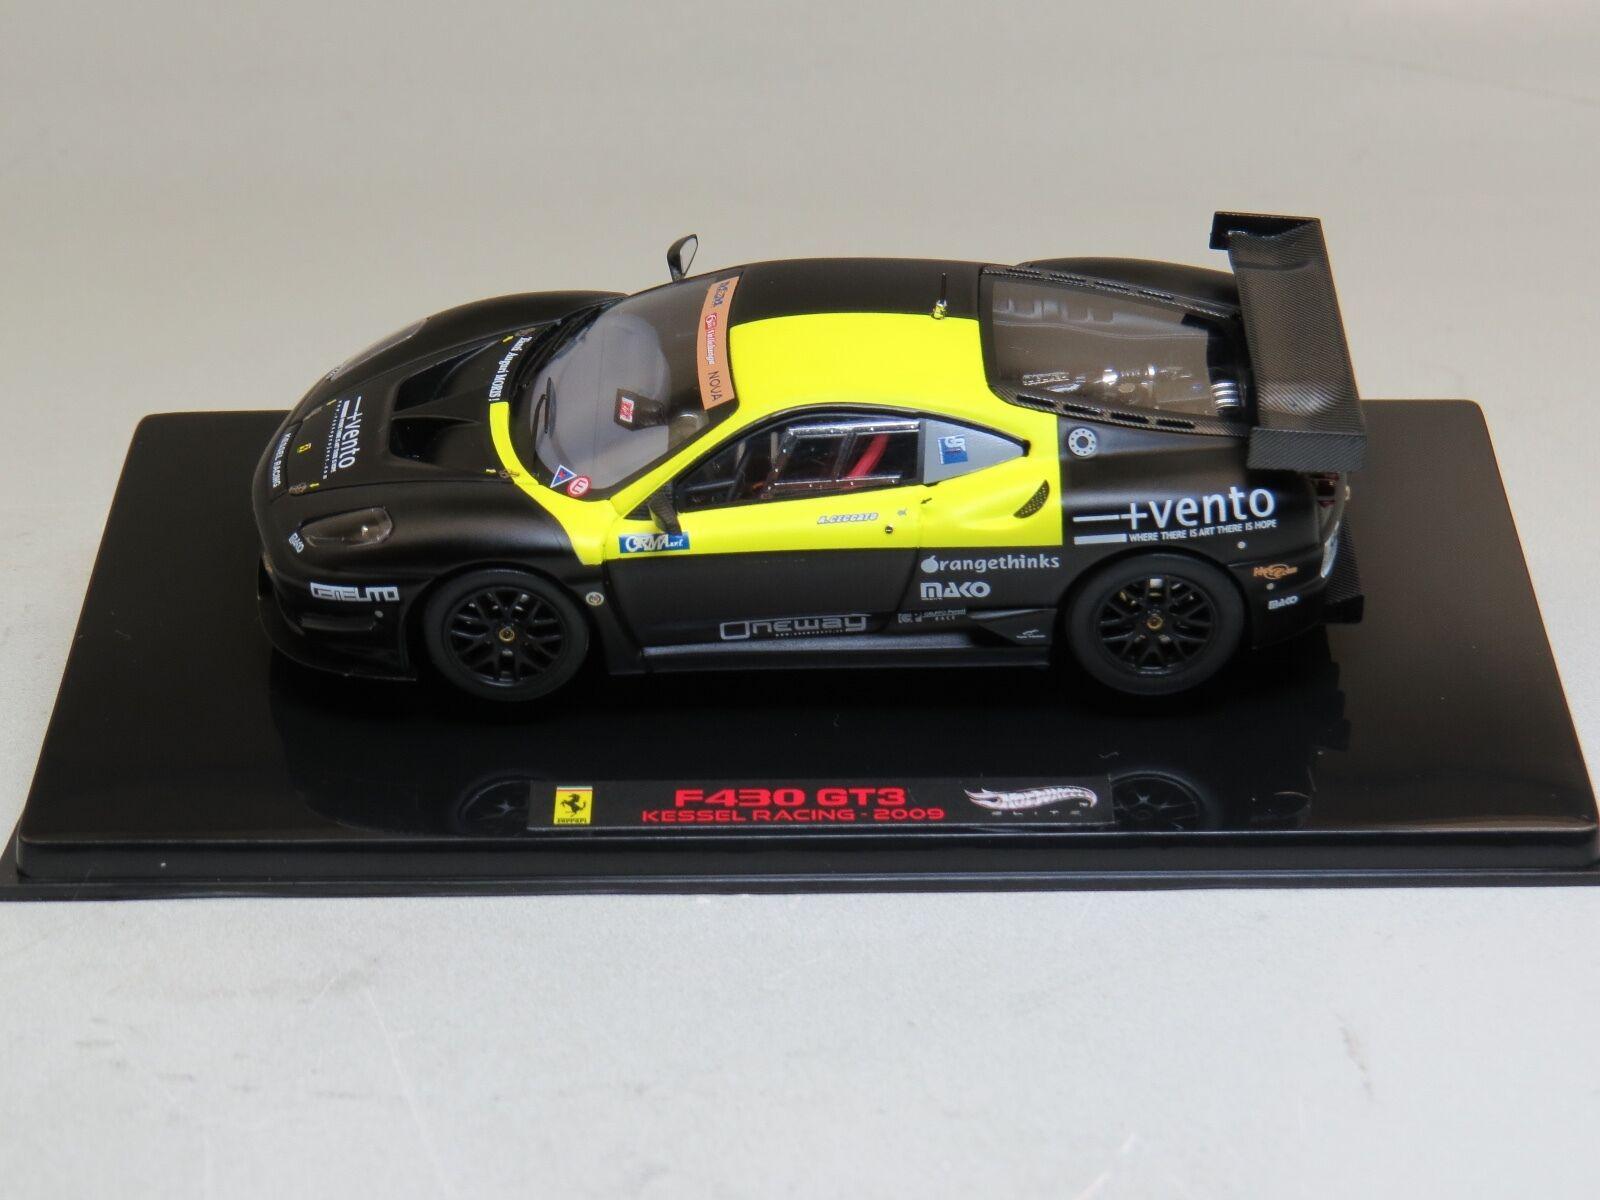 Ferrari F430 GT3 Kessel Racing - 2009 2009 2009 1 43 Hotwheels Elite 1a71f6